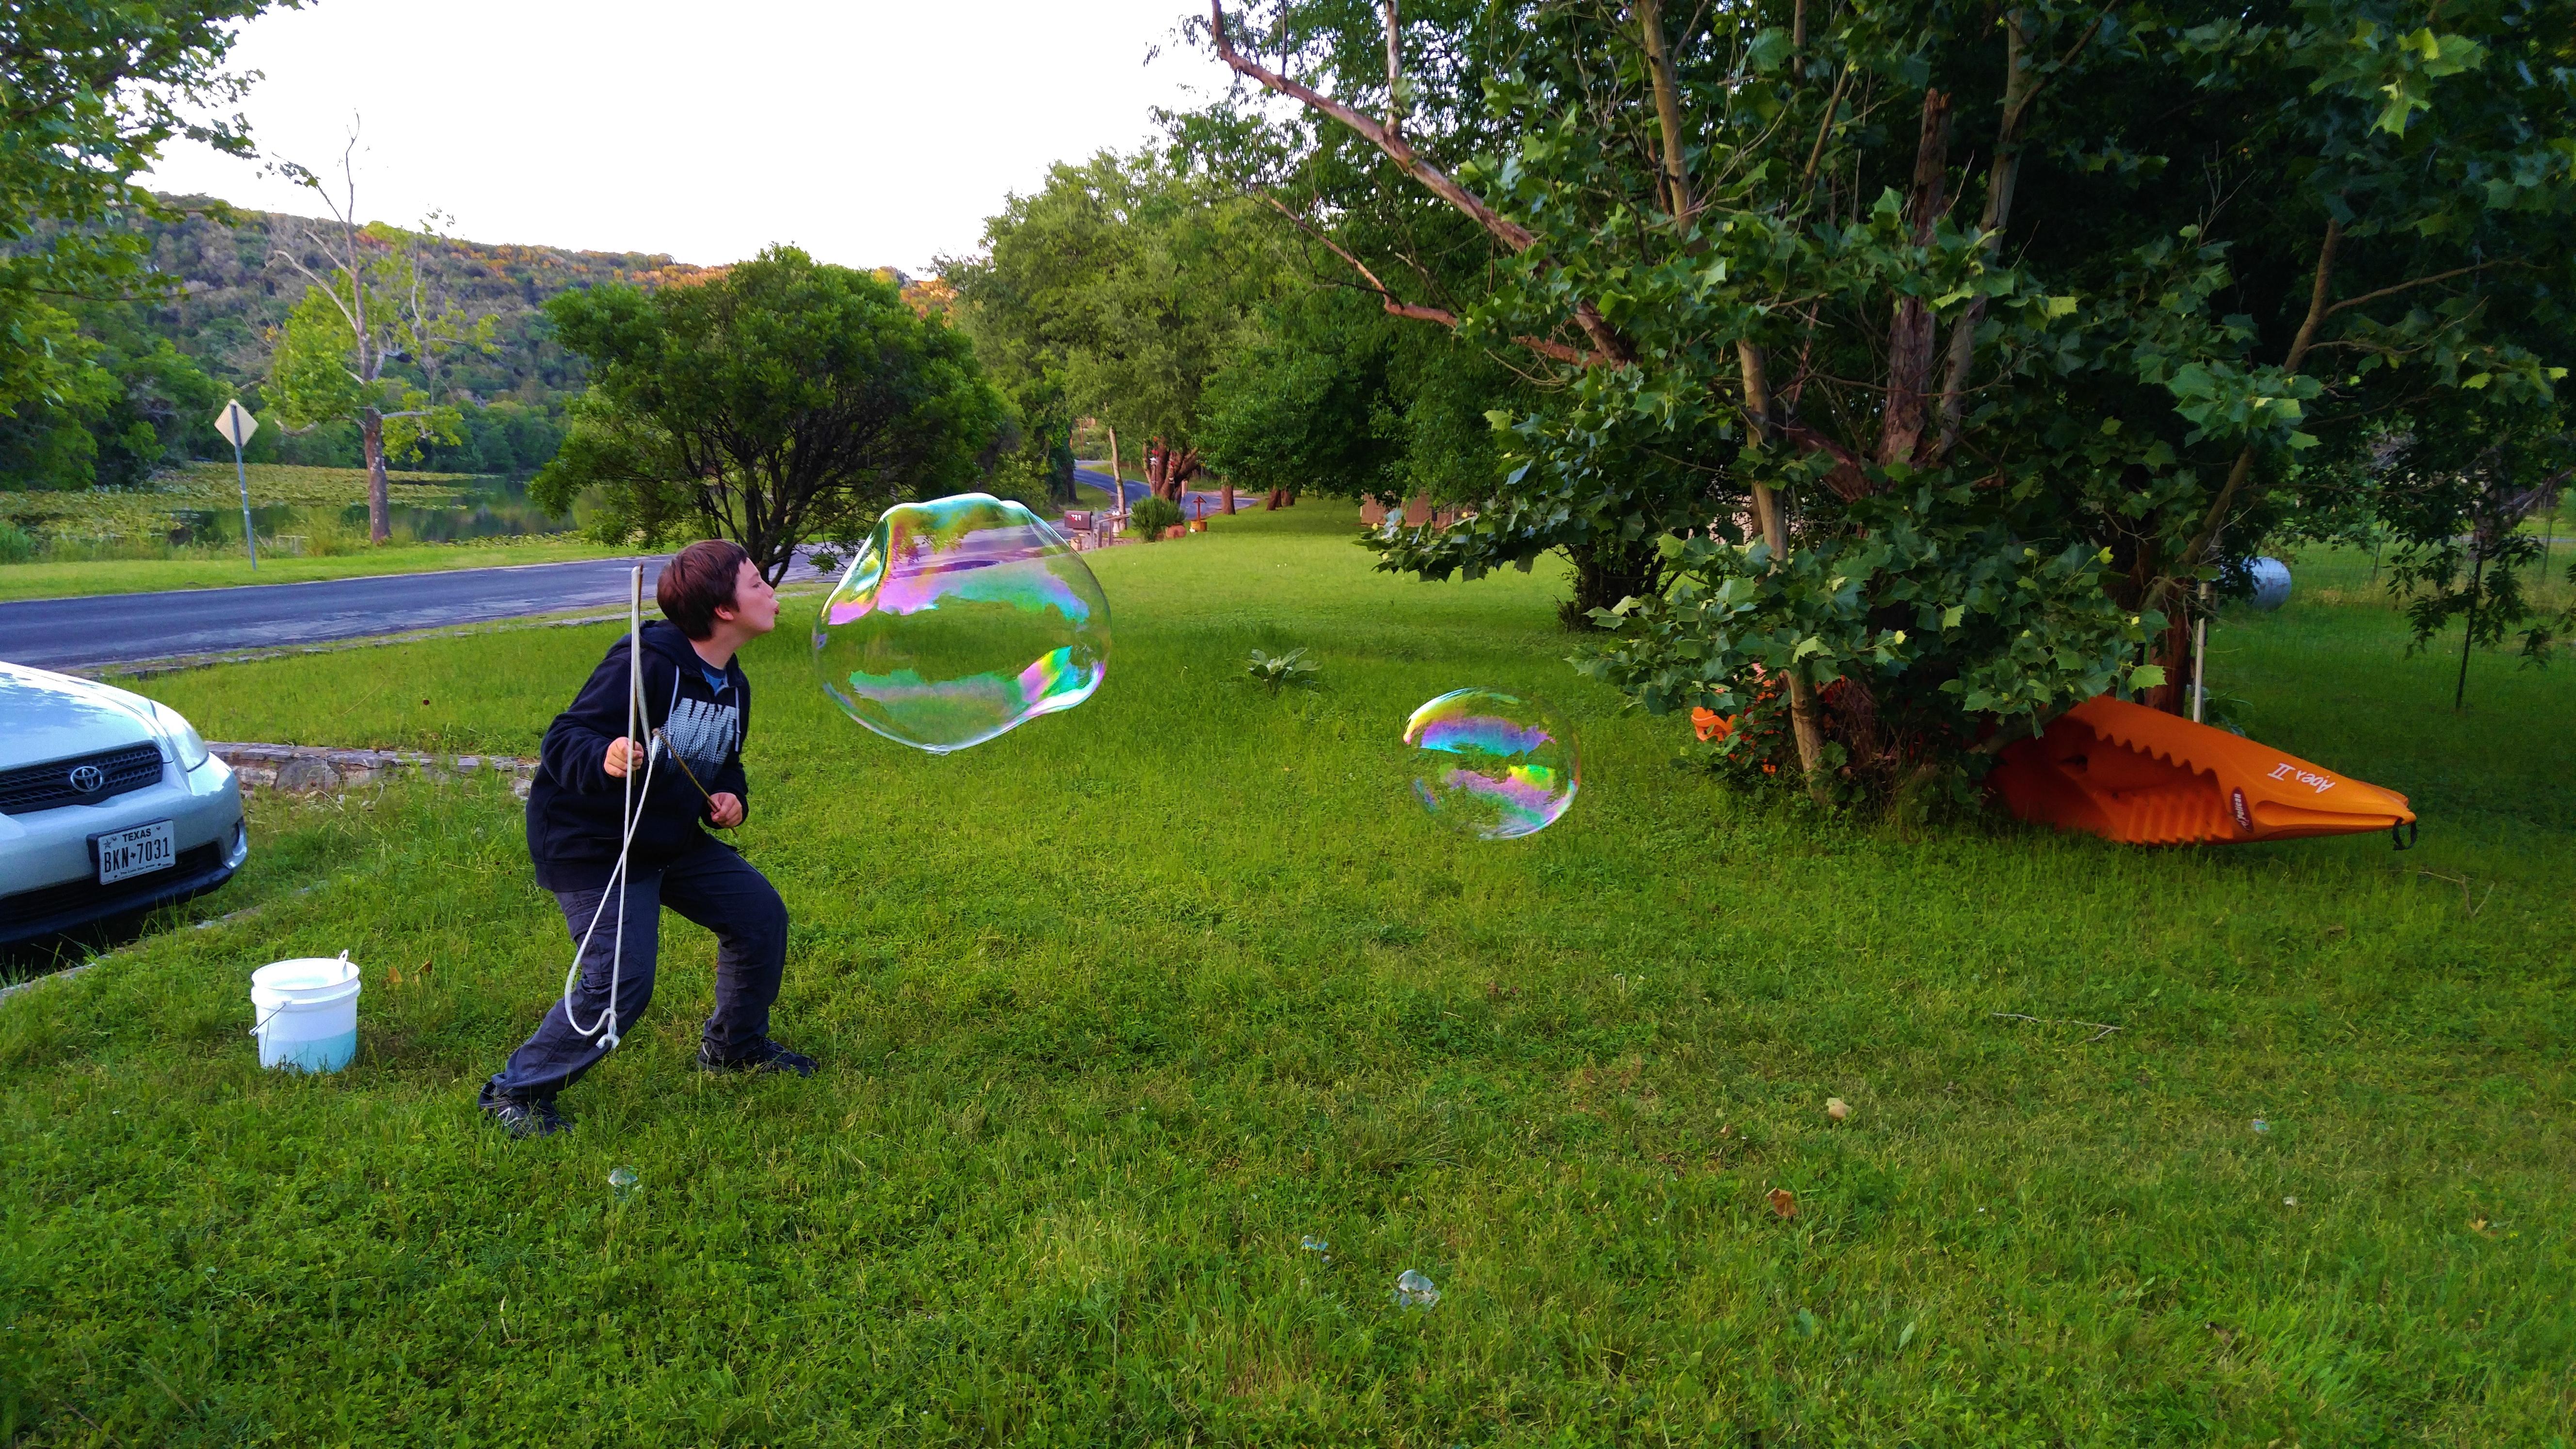 Picture of Bodacious Bubble Trick - Bubble/s in a Bubble